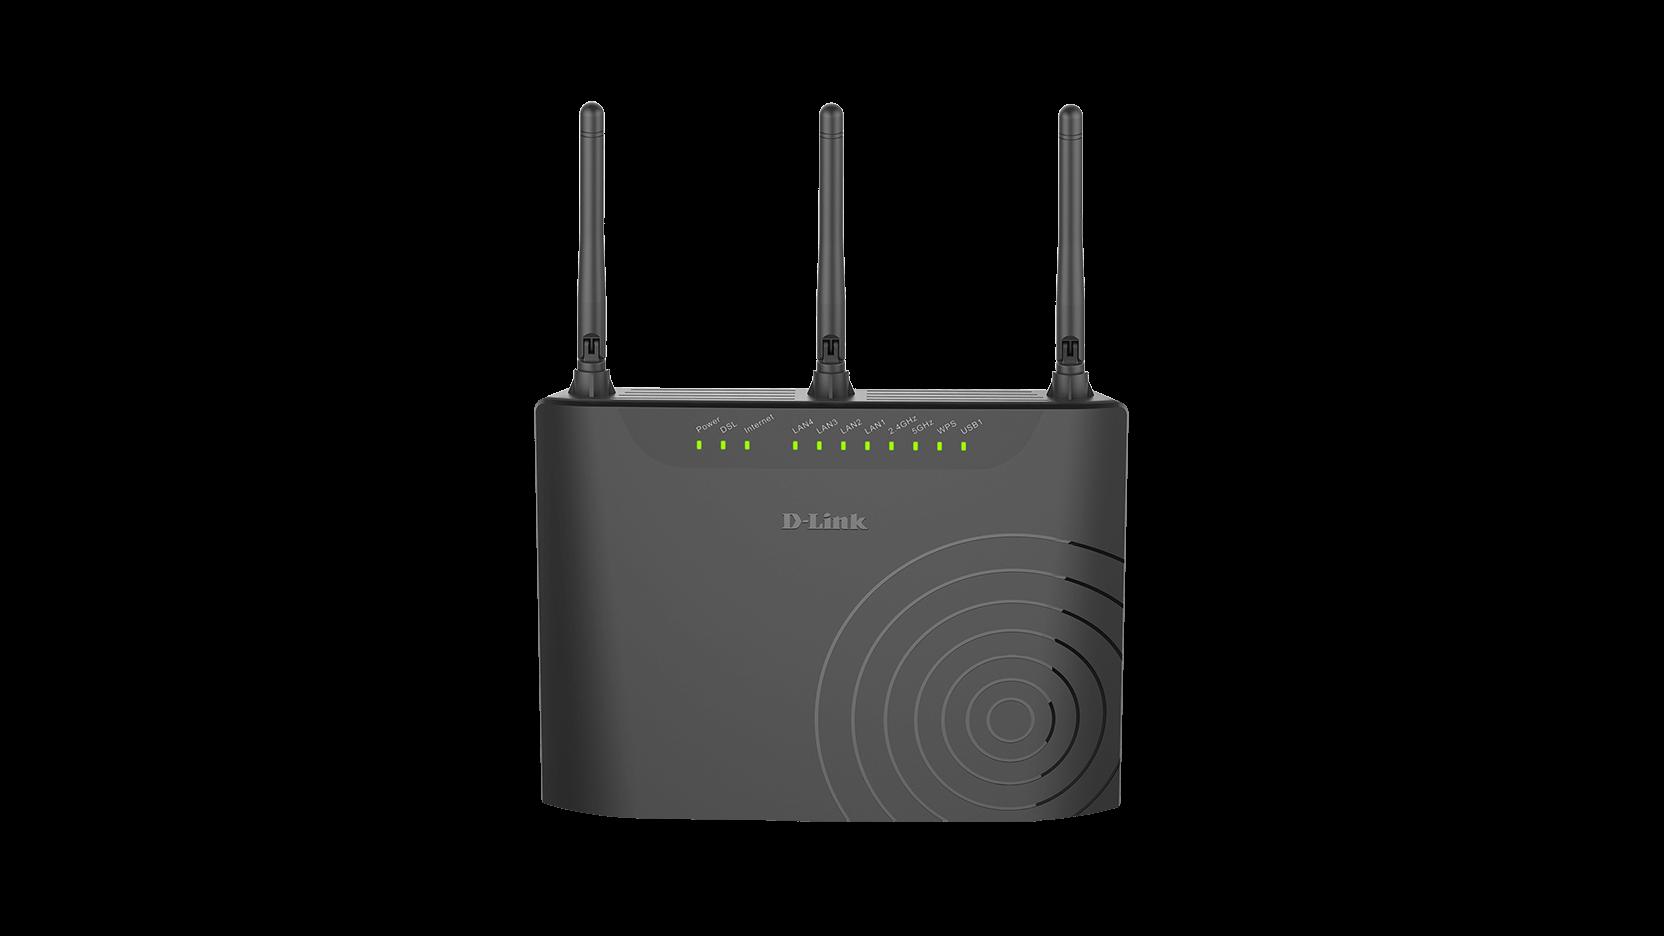 DSL-3682 Wireless AC750 Dual-Band VDSL ADSL Modem Router